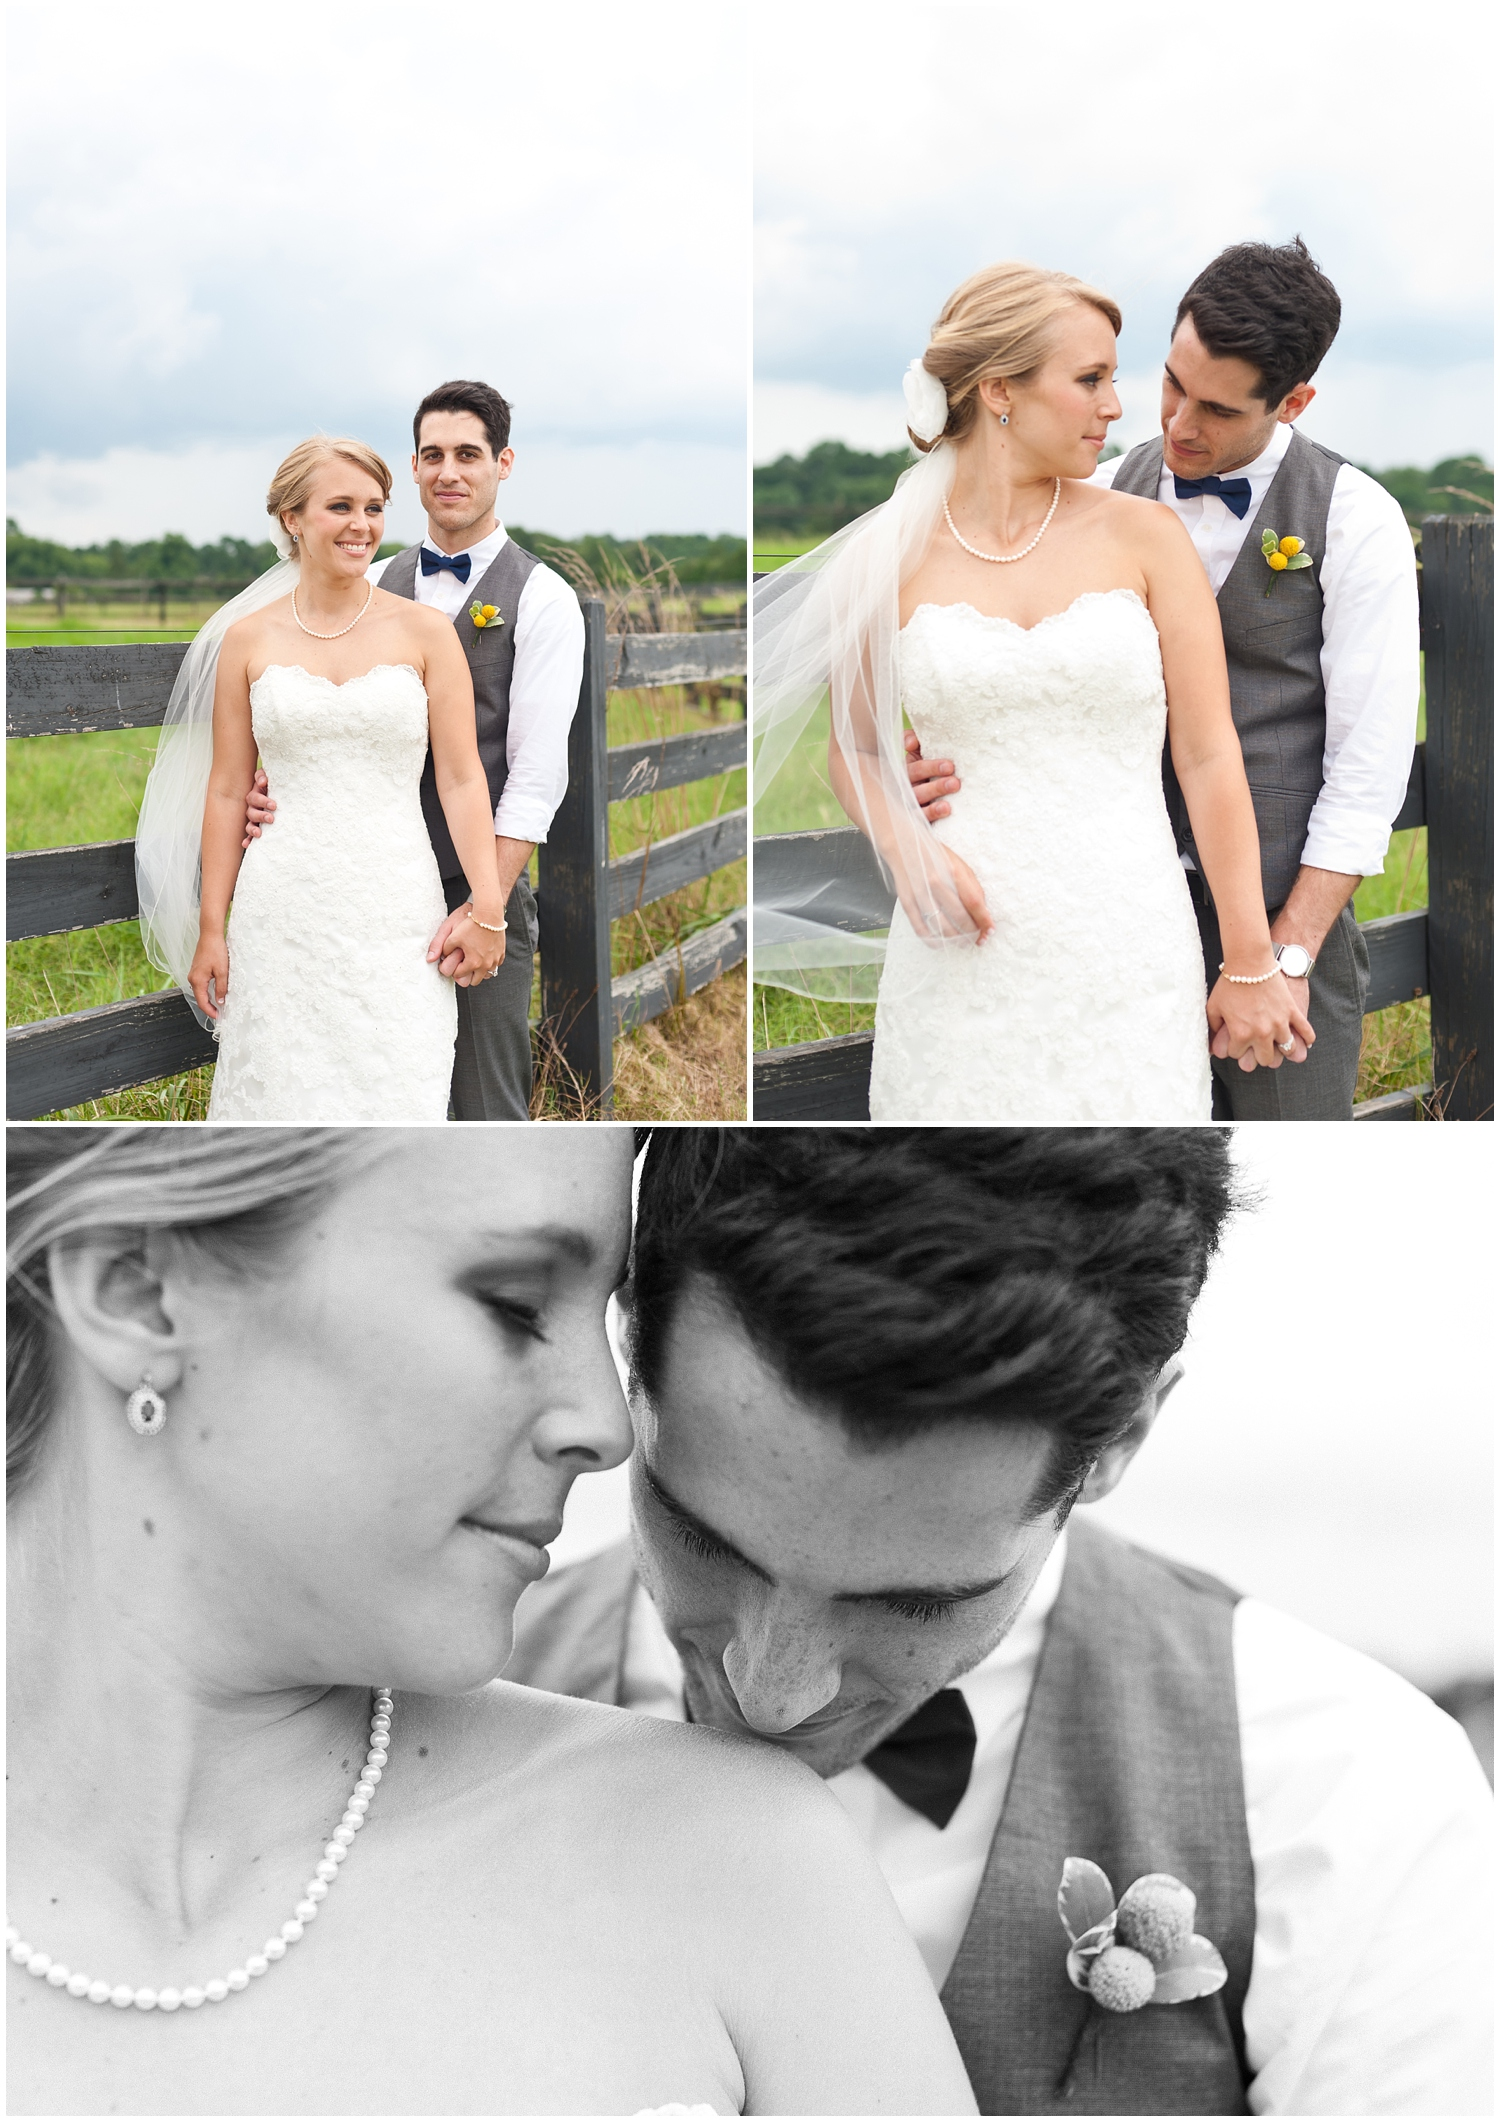 BloomandLo_PeteandAshley_Smithonia_Farm_Wedding_Blog_0026.jpg